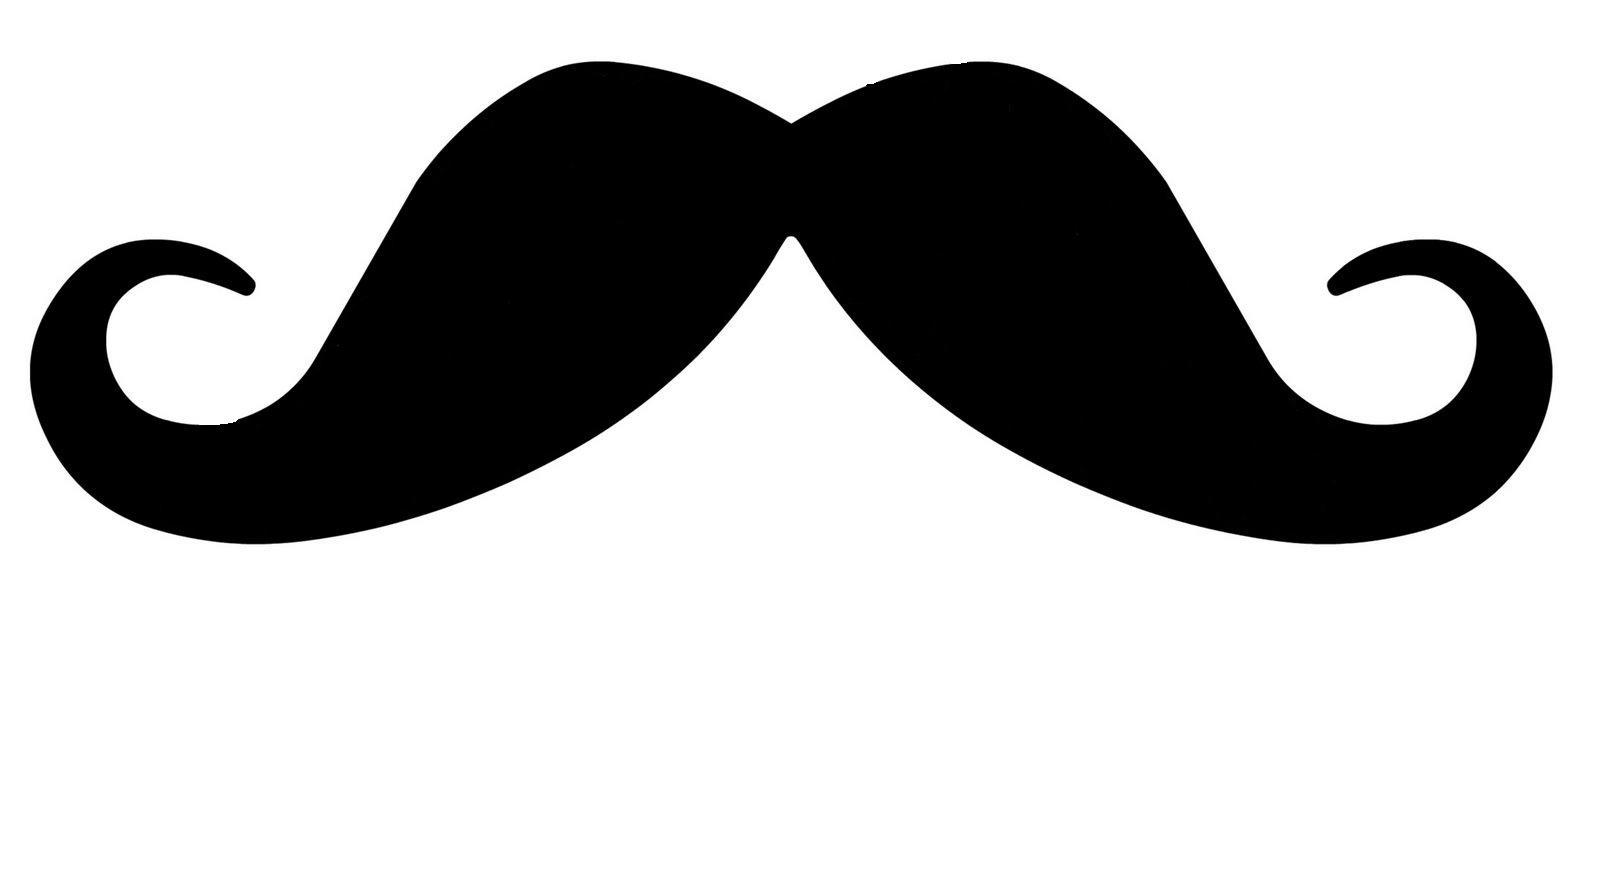 Mustache Outline Clipart - Clipart Kid